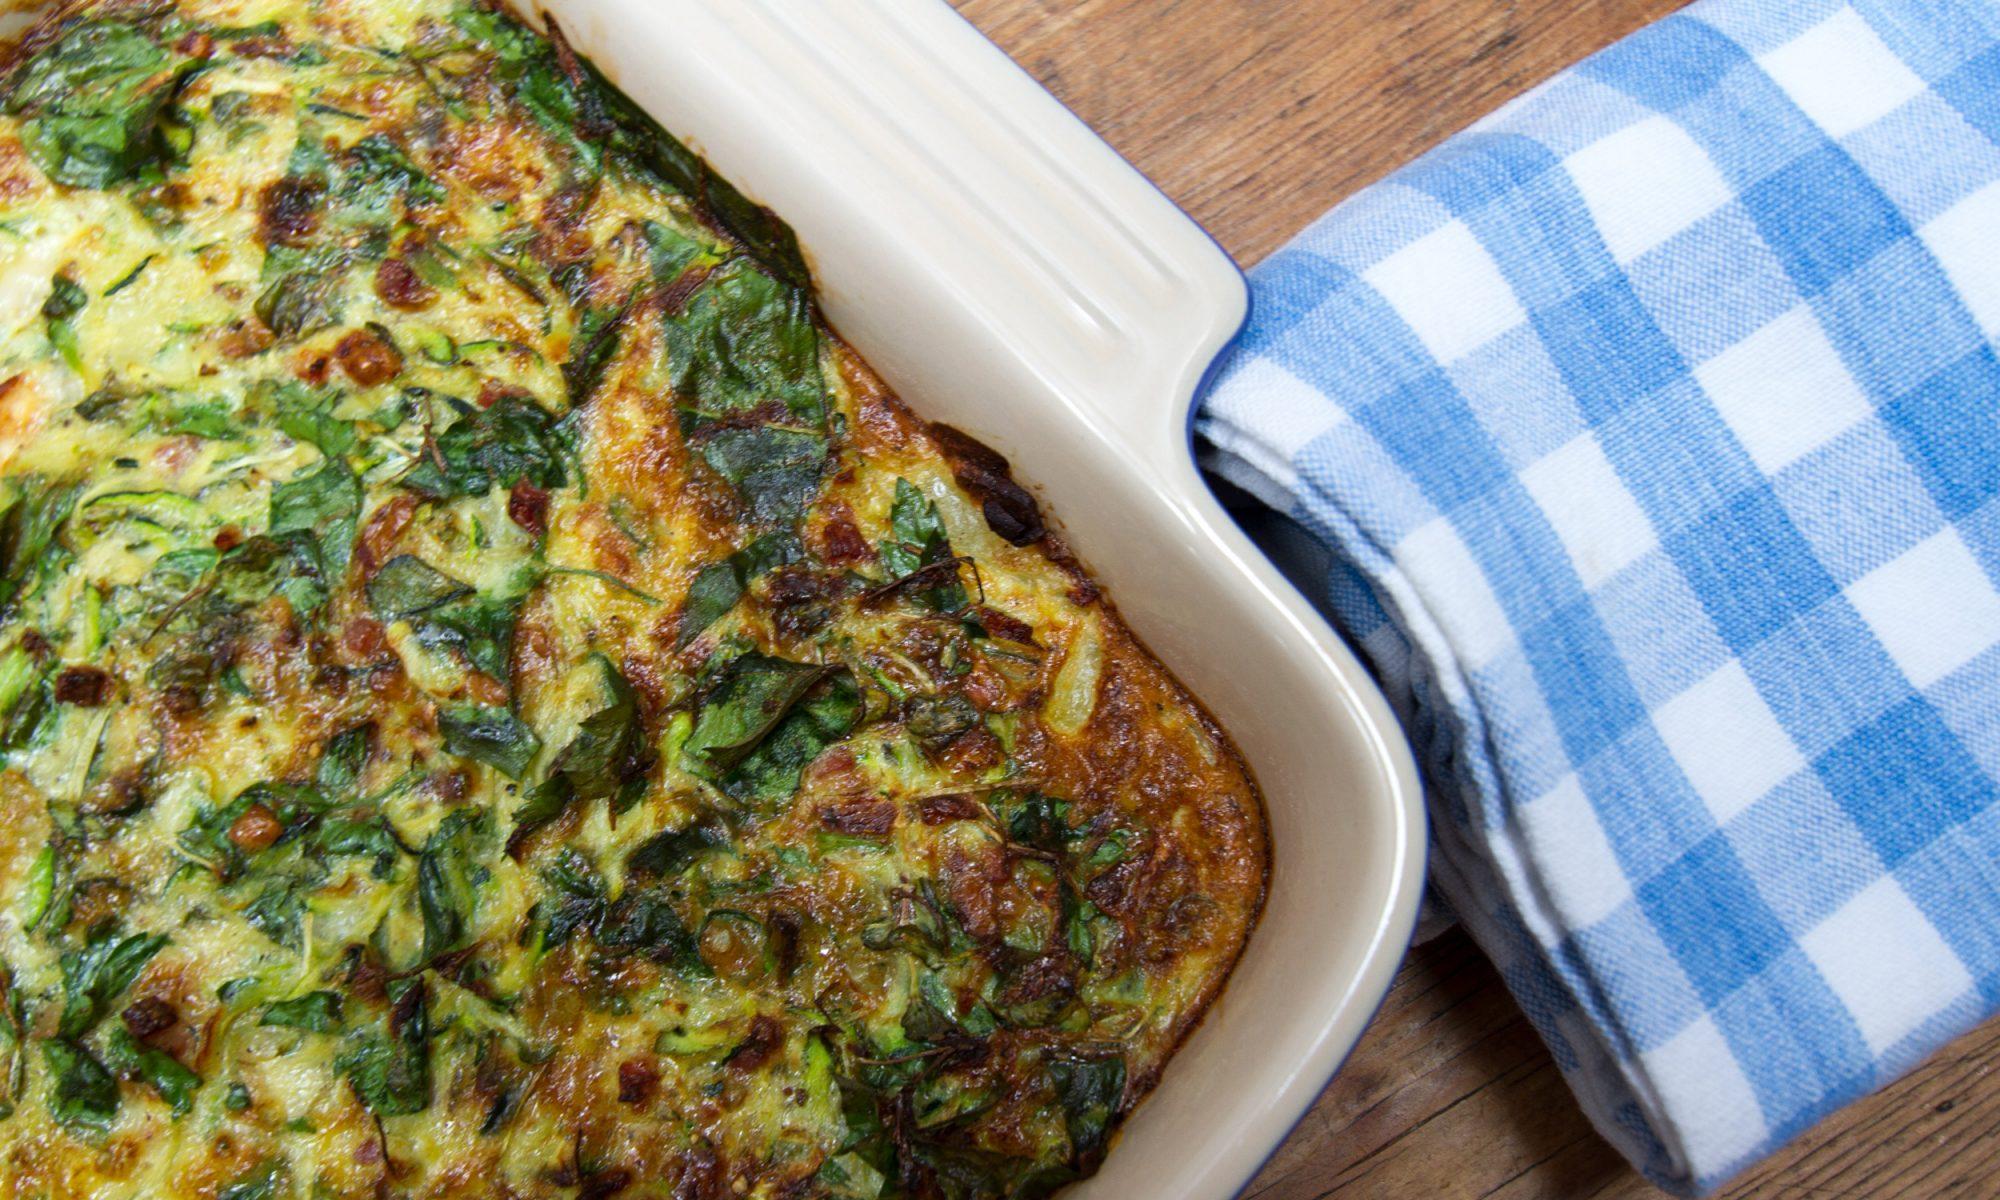 EC: 5 Hearty Breakfast Casseroles to Make Ahead and Eat All Week